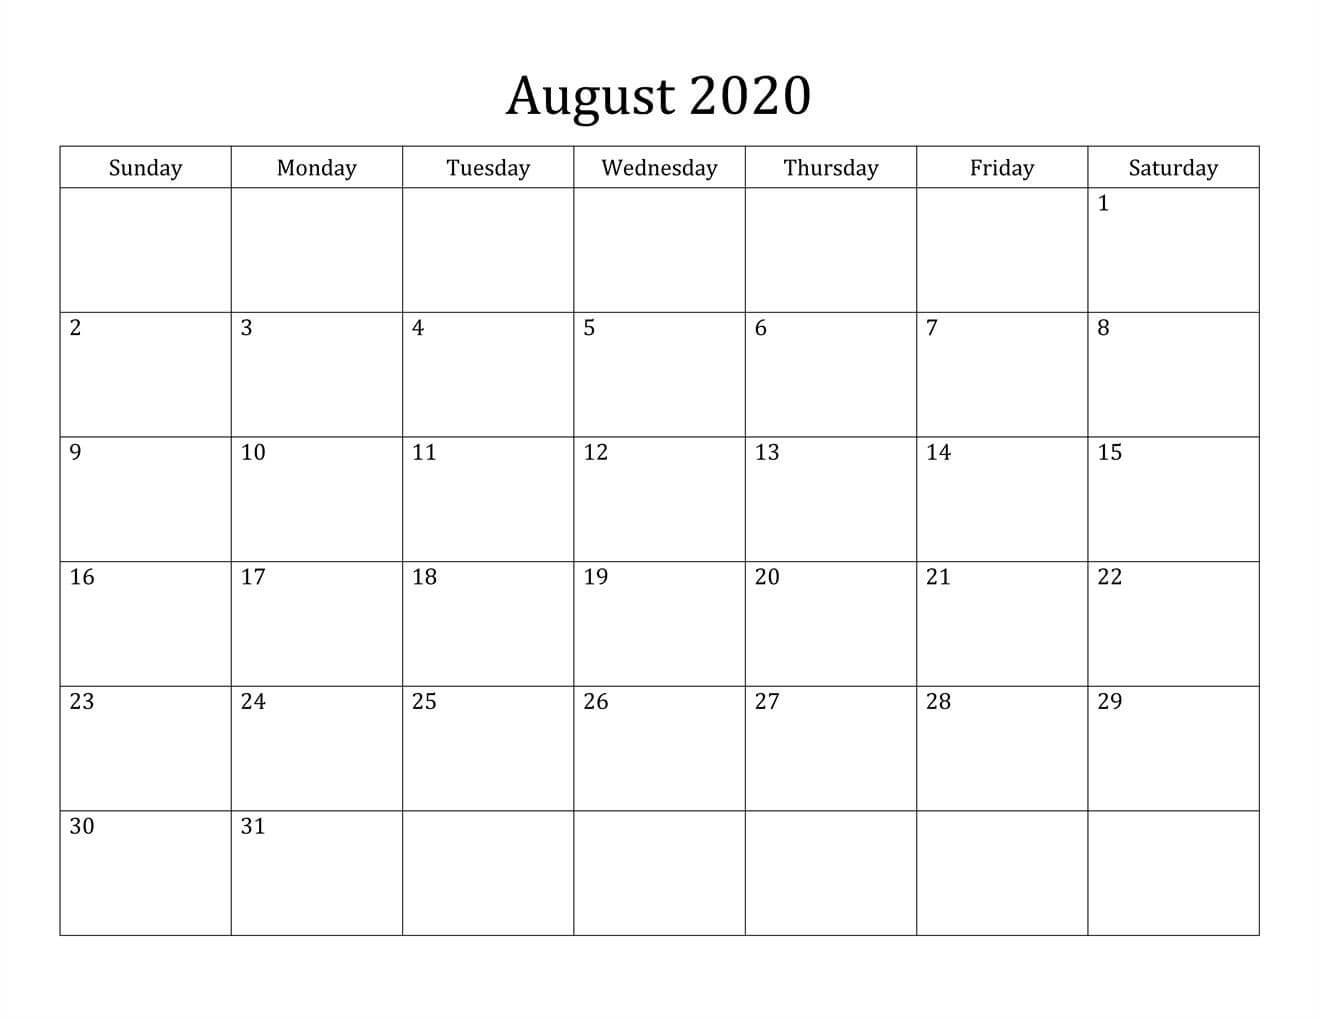 August 2020 Calendar PDF download